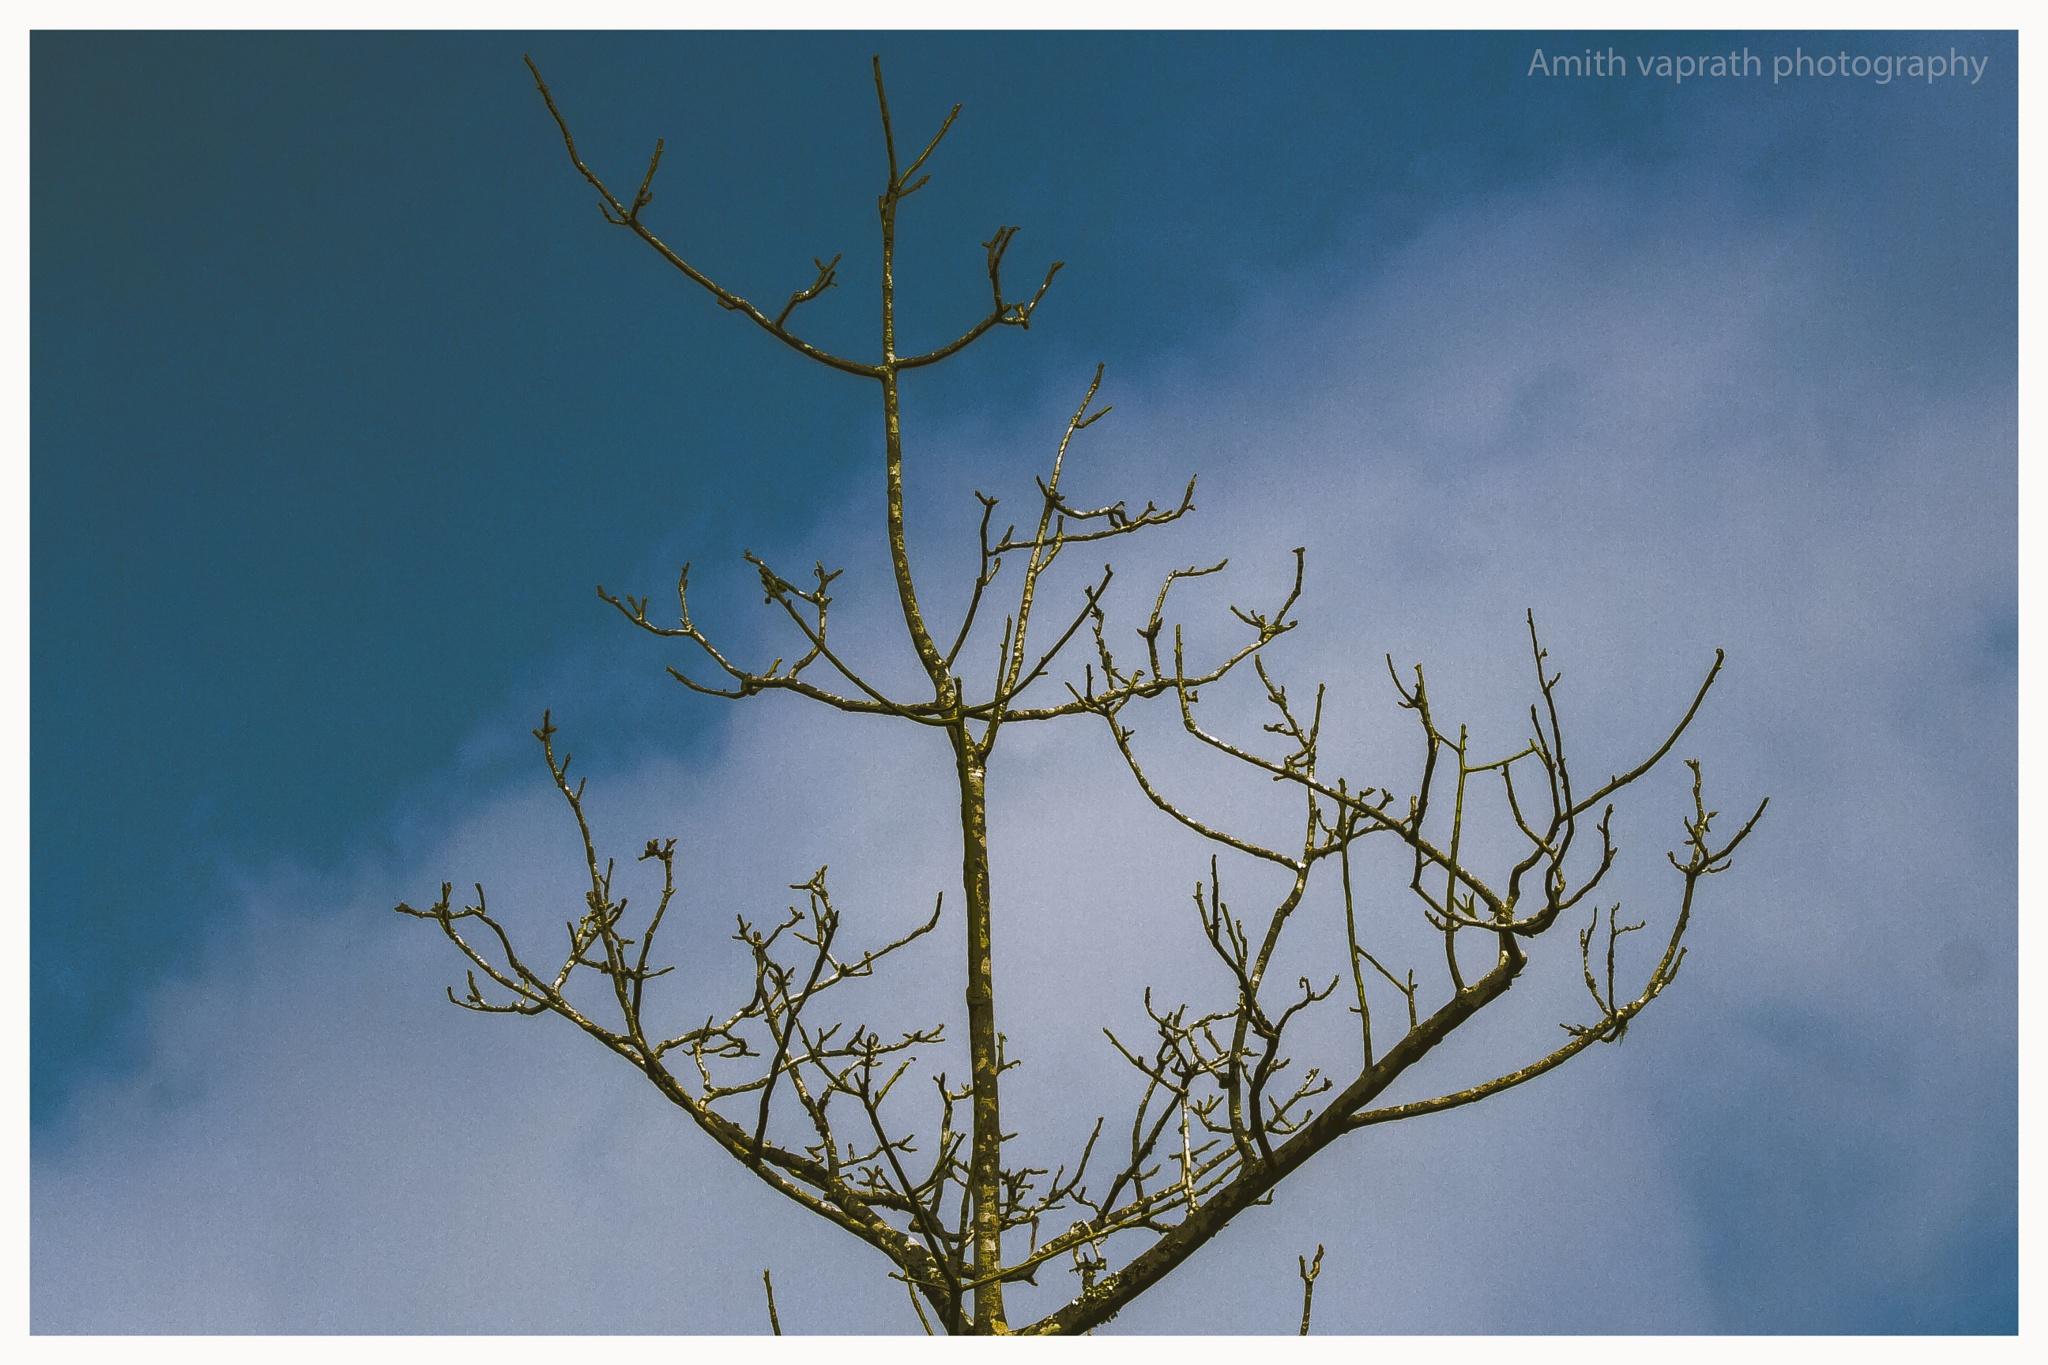 Untitled by Amith Vaprath